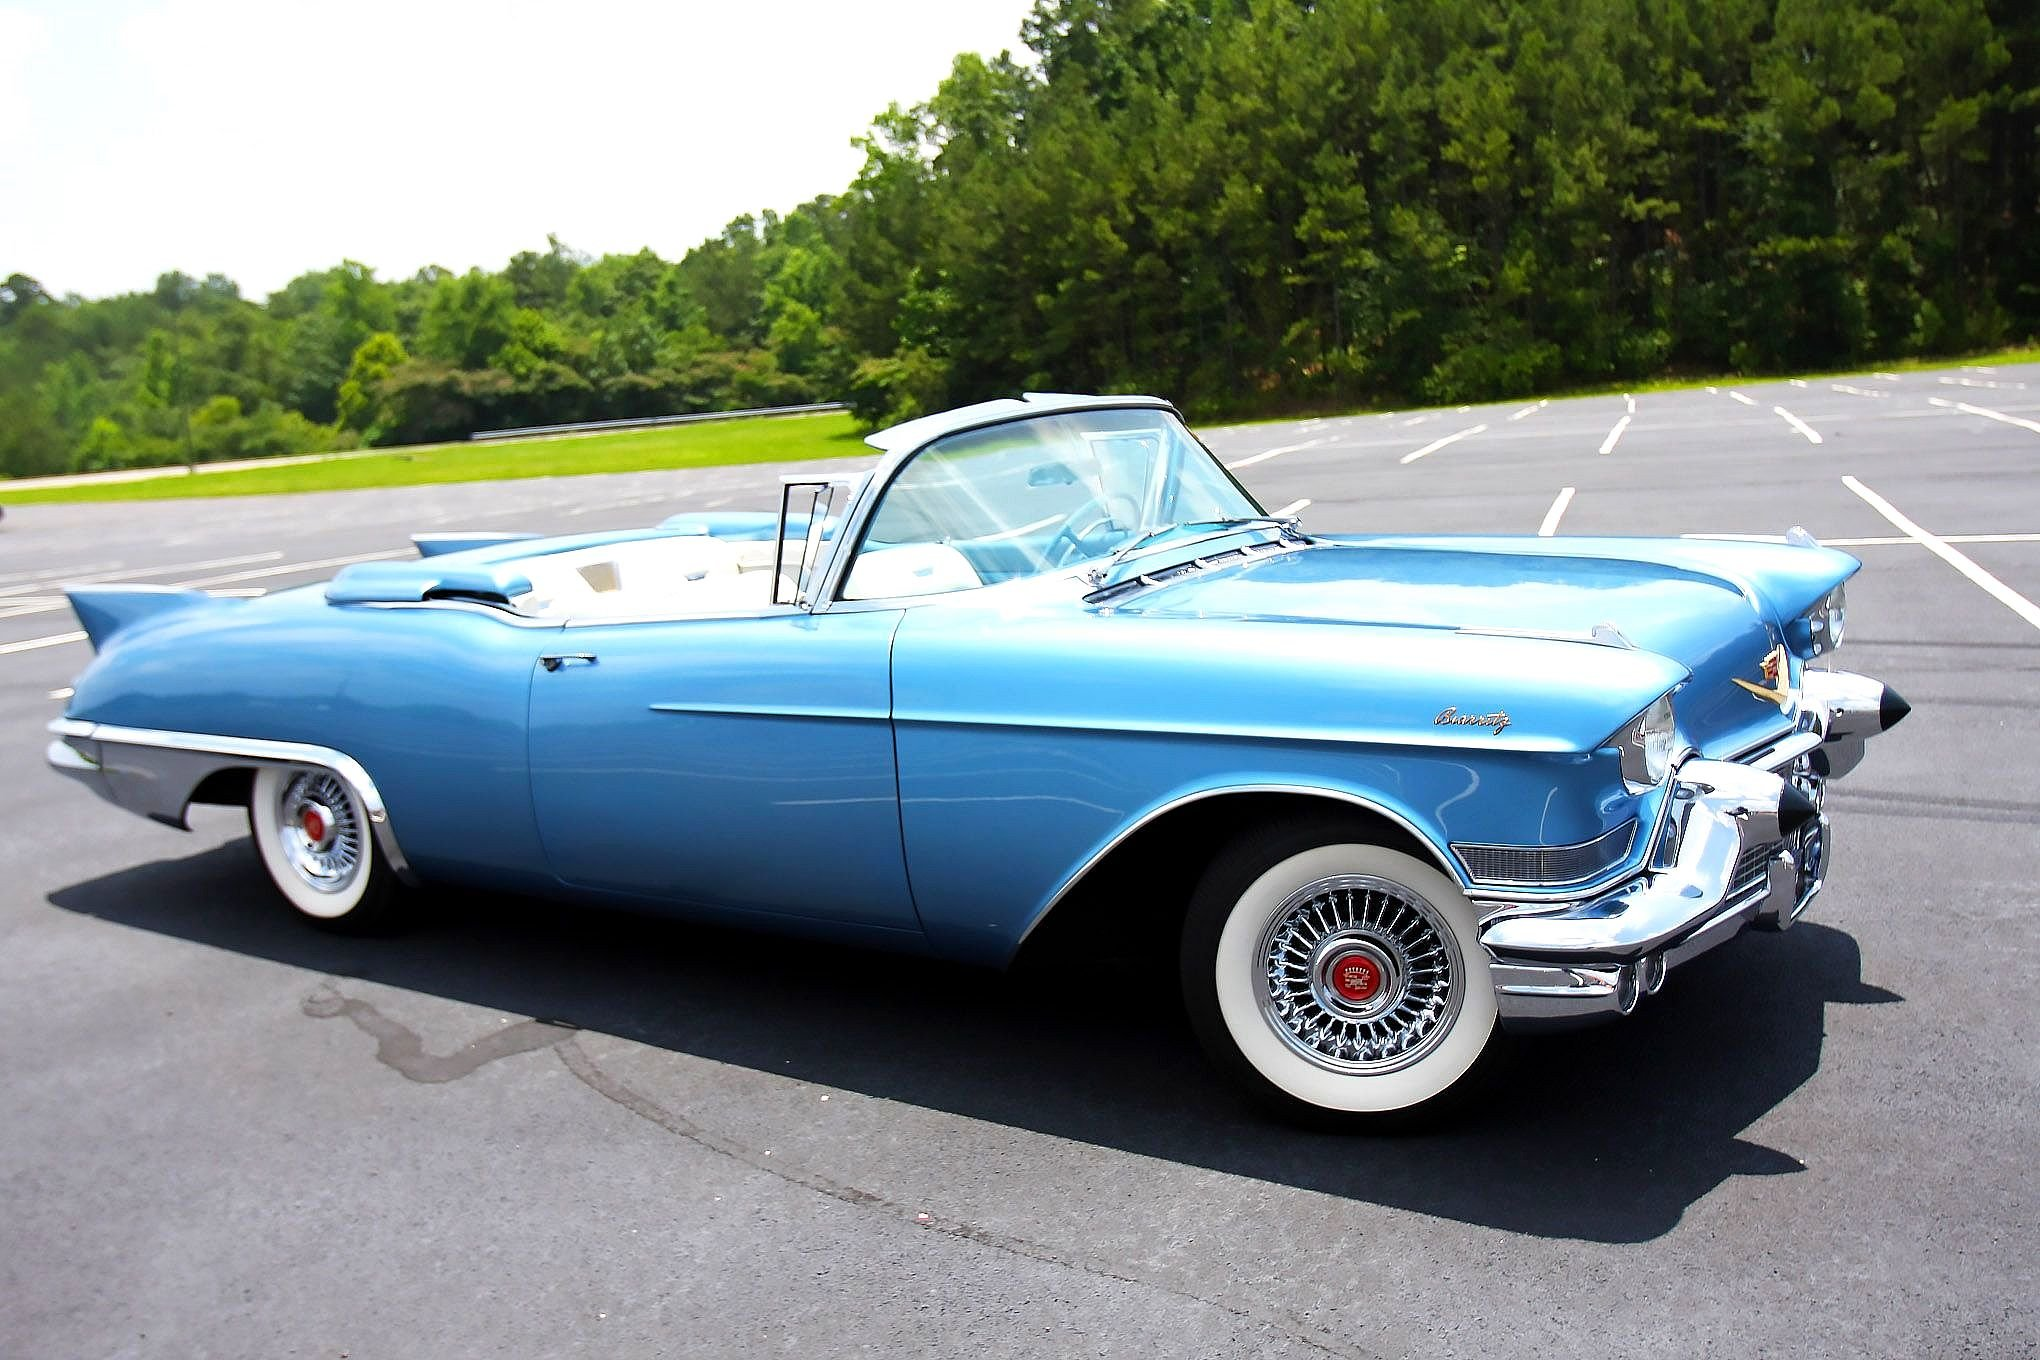 Dorable Old Convertible Collection - Classic Cars Ideas - boiq.info